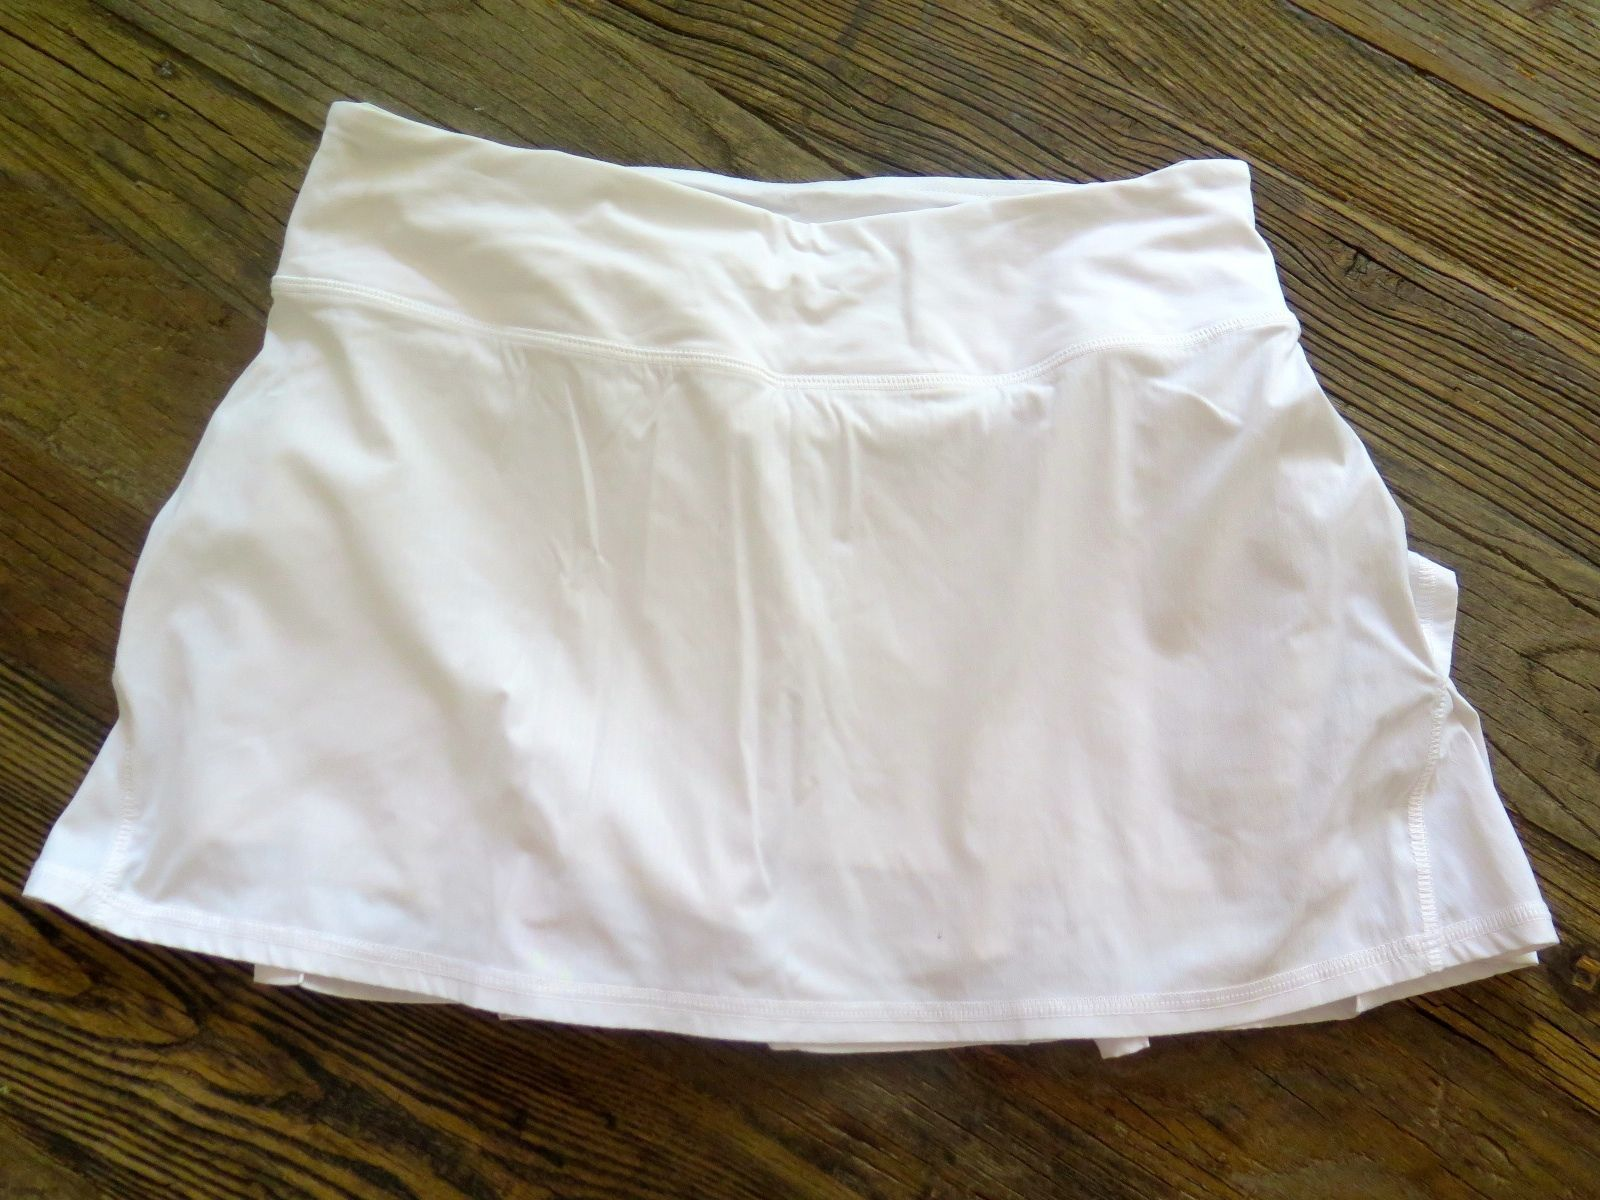 $  41.00 (29 Bids)End Date: Jun-12 11:24Bid now  |  Add to watch listBuy this on eBay (Category:Women's Clothing)...